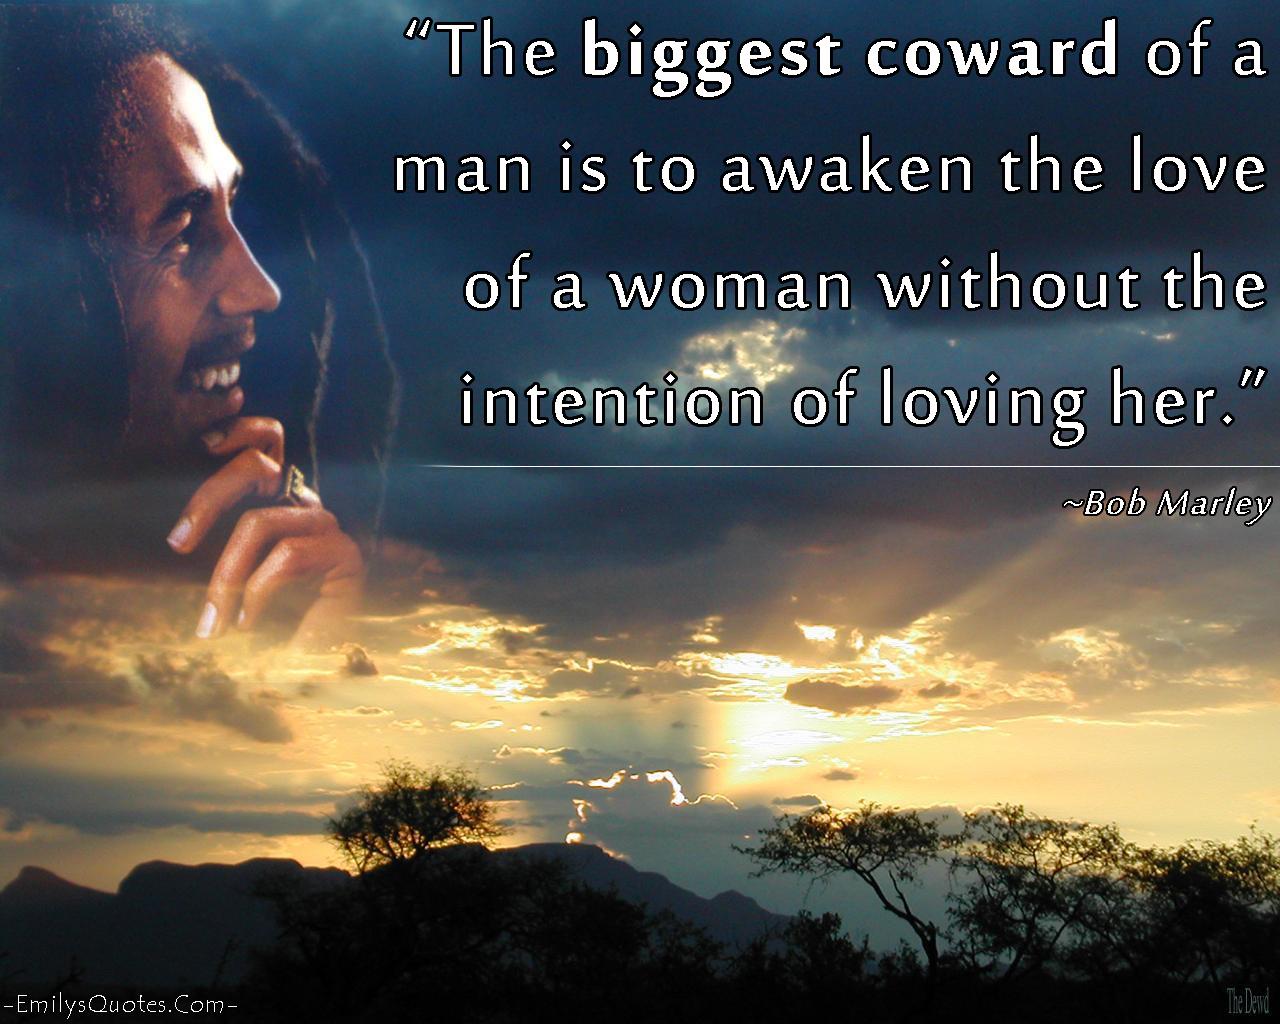 EmilysQuotes.Com - coward, love, fear, sad, relationship, Bob Marley, great